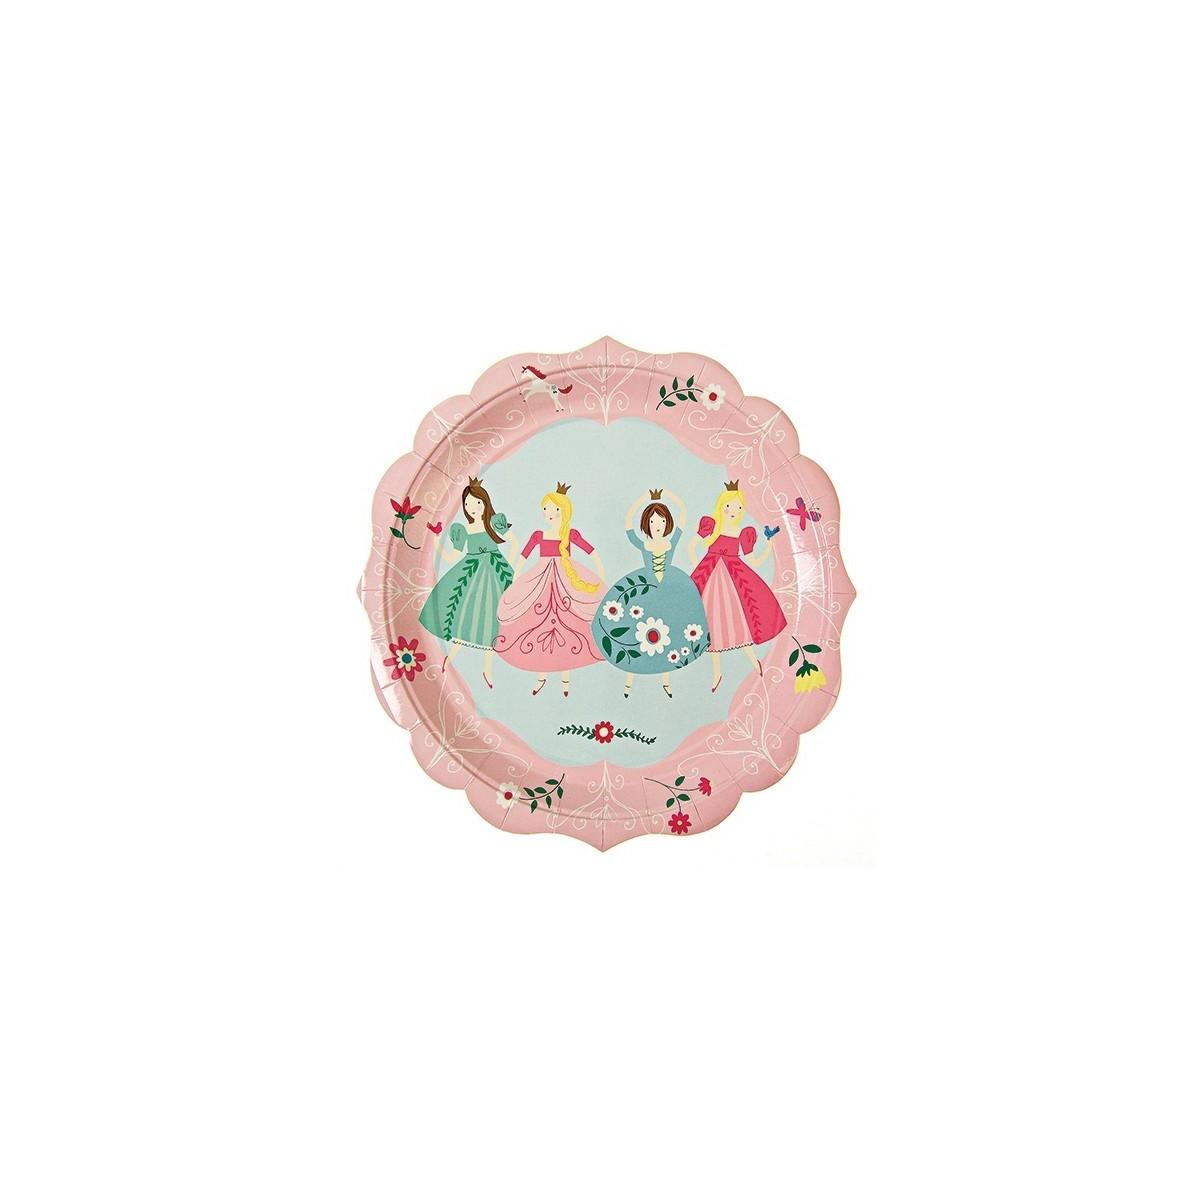 Assiette Princesse de la marque Meri Meri